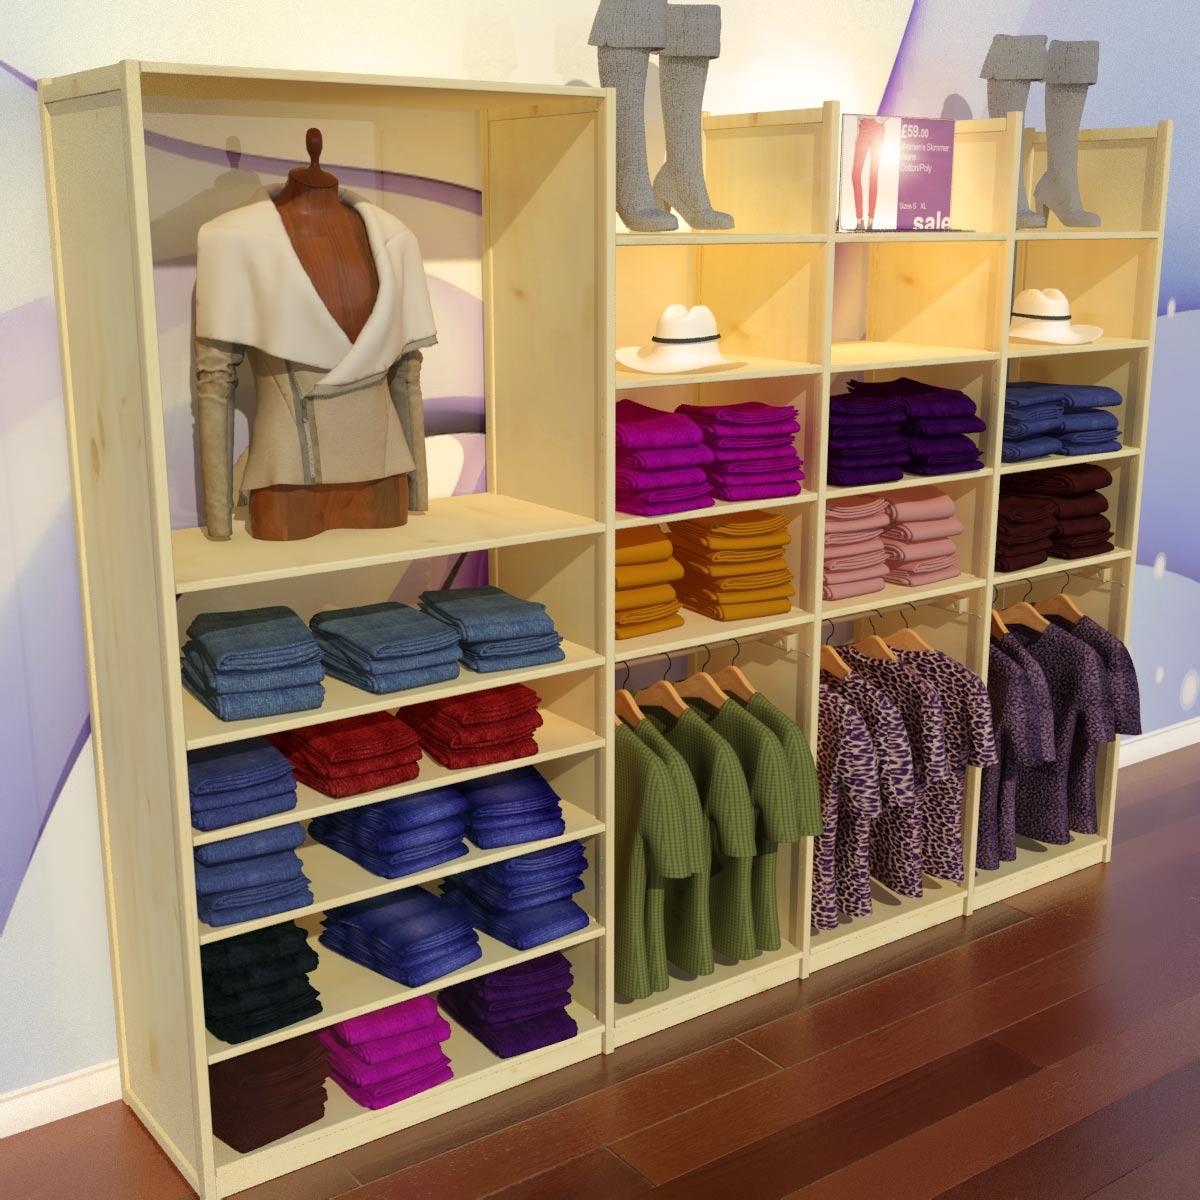 Similiar Small Boutique Interior Design Ideas Keywords